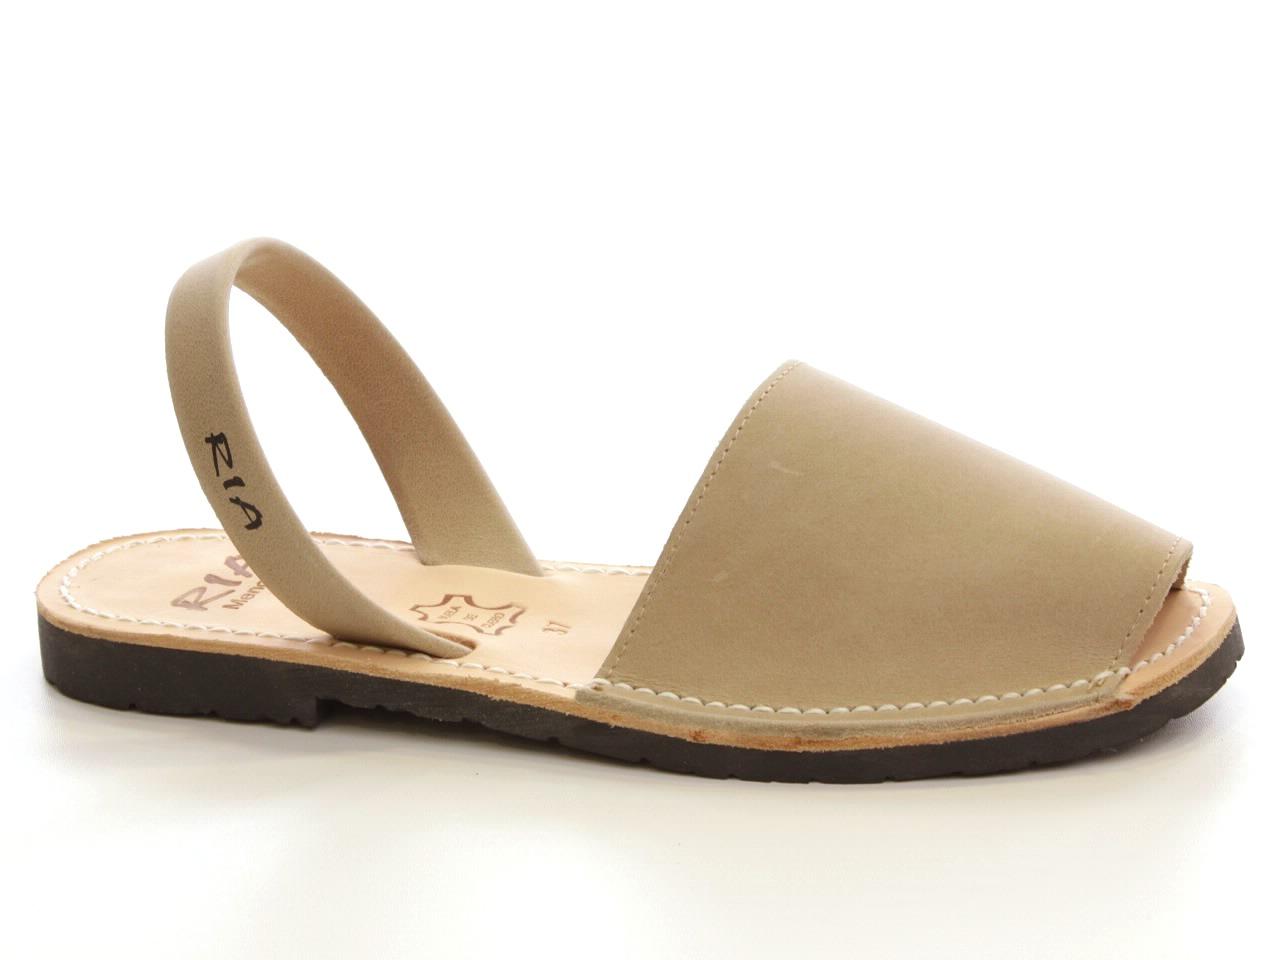 Sandales Plates Ria Menorca - 489 20002-S2